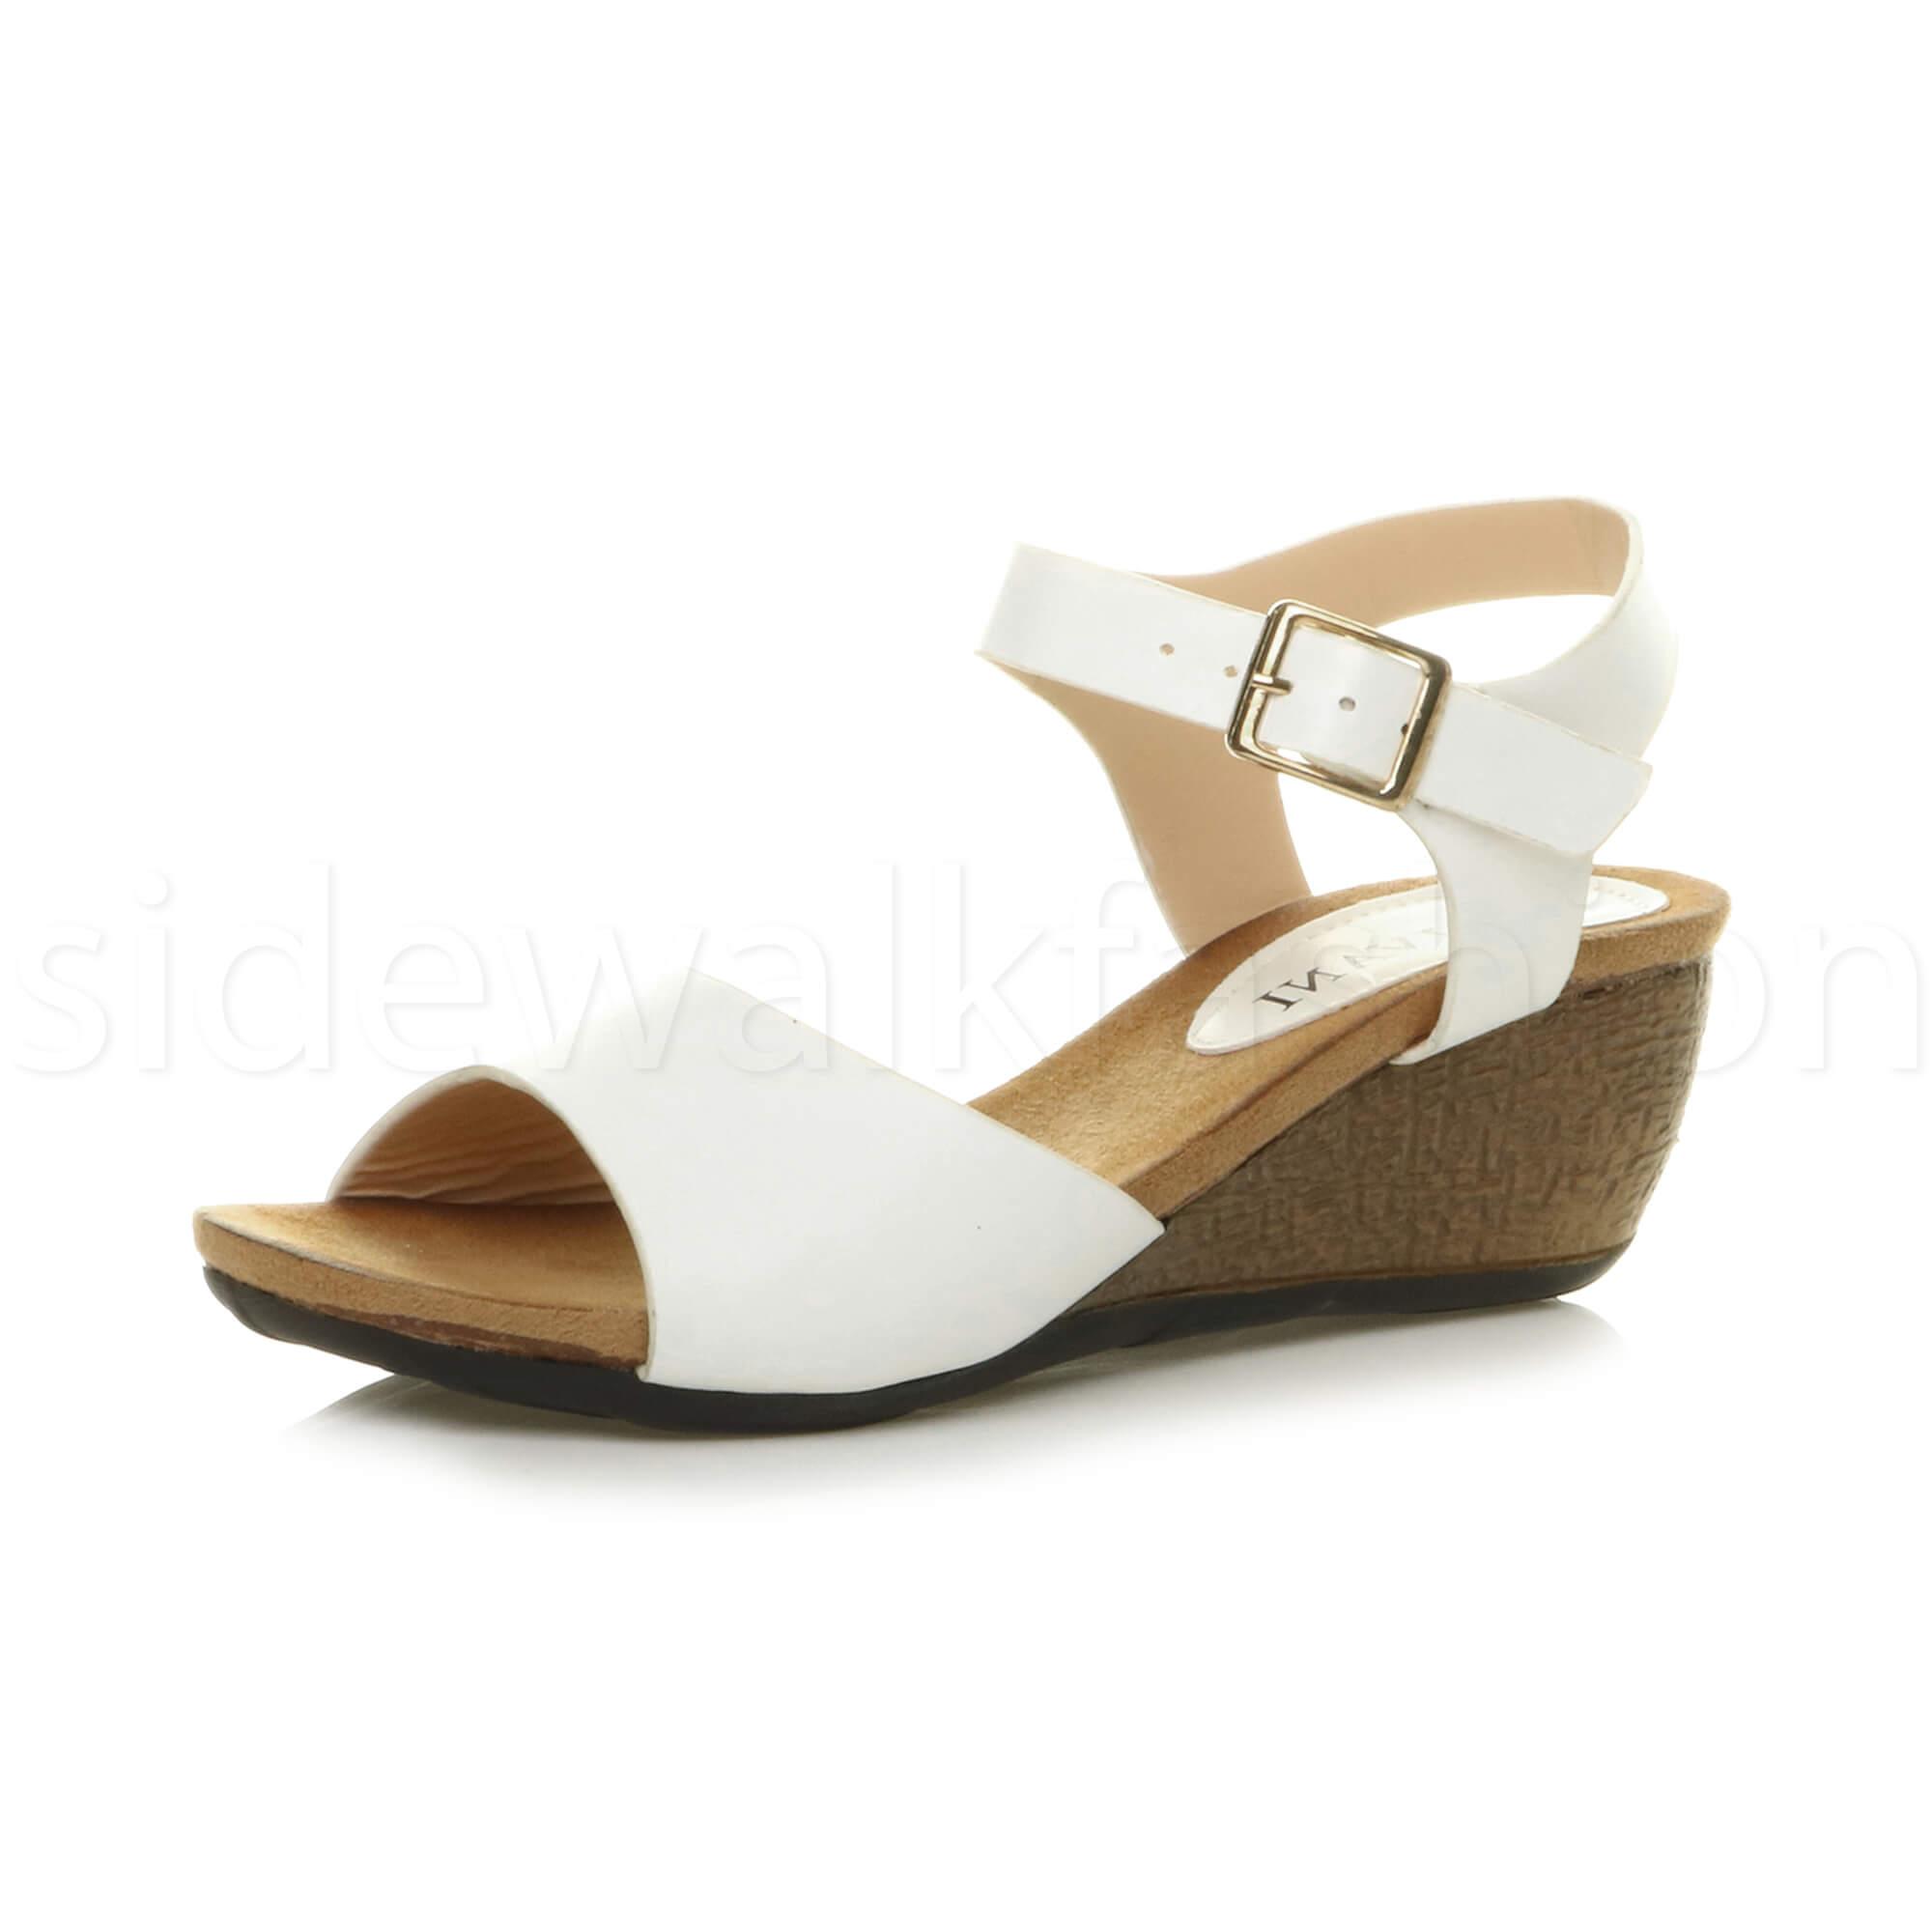 White platform mid heel sandals summer walking shoes new size 8 unworn